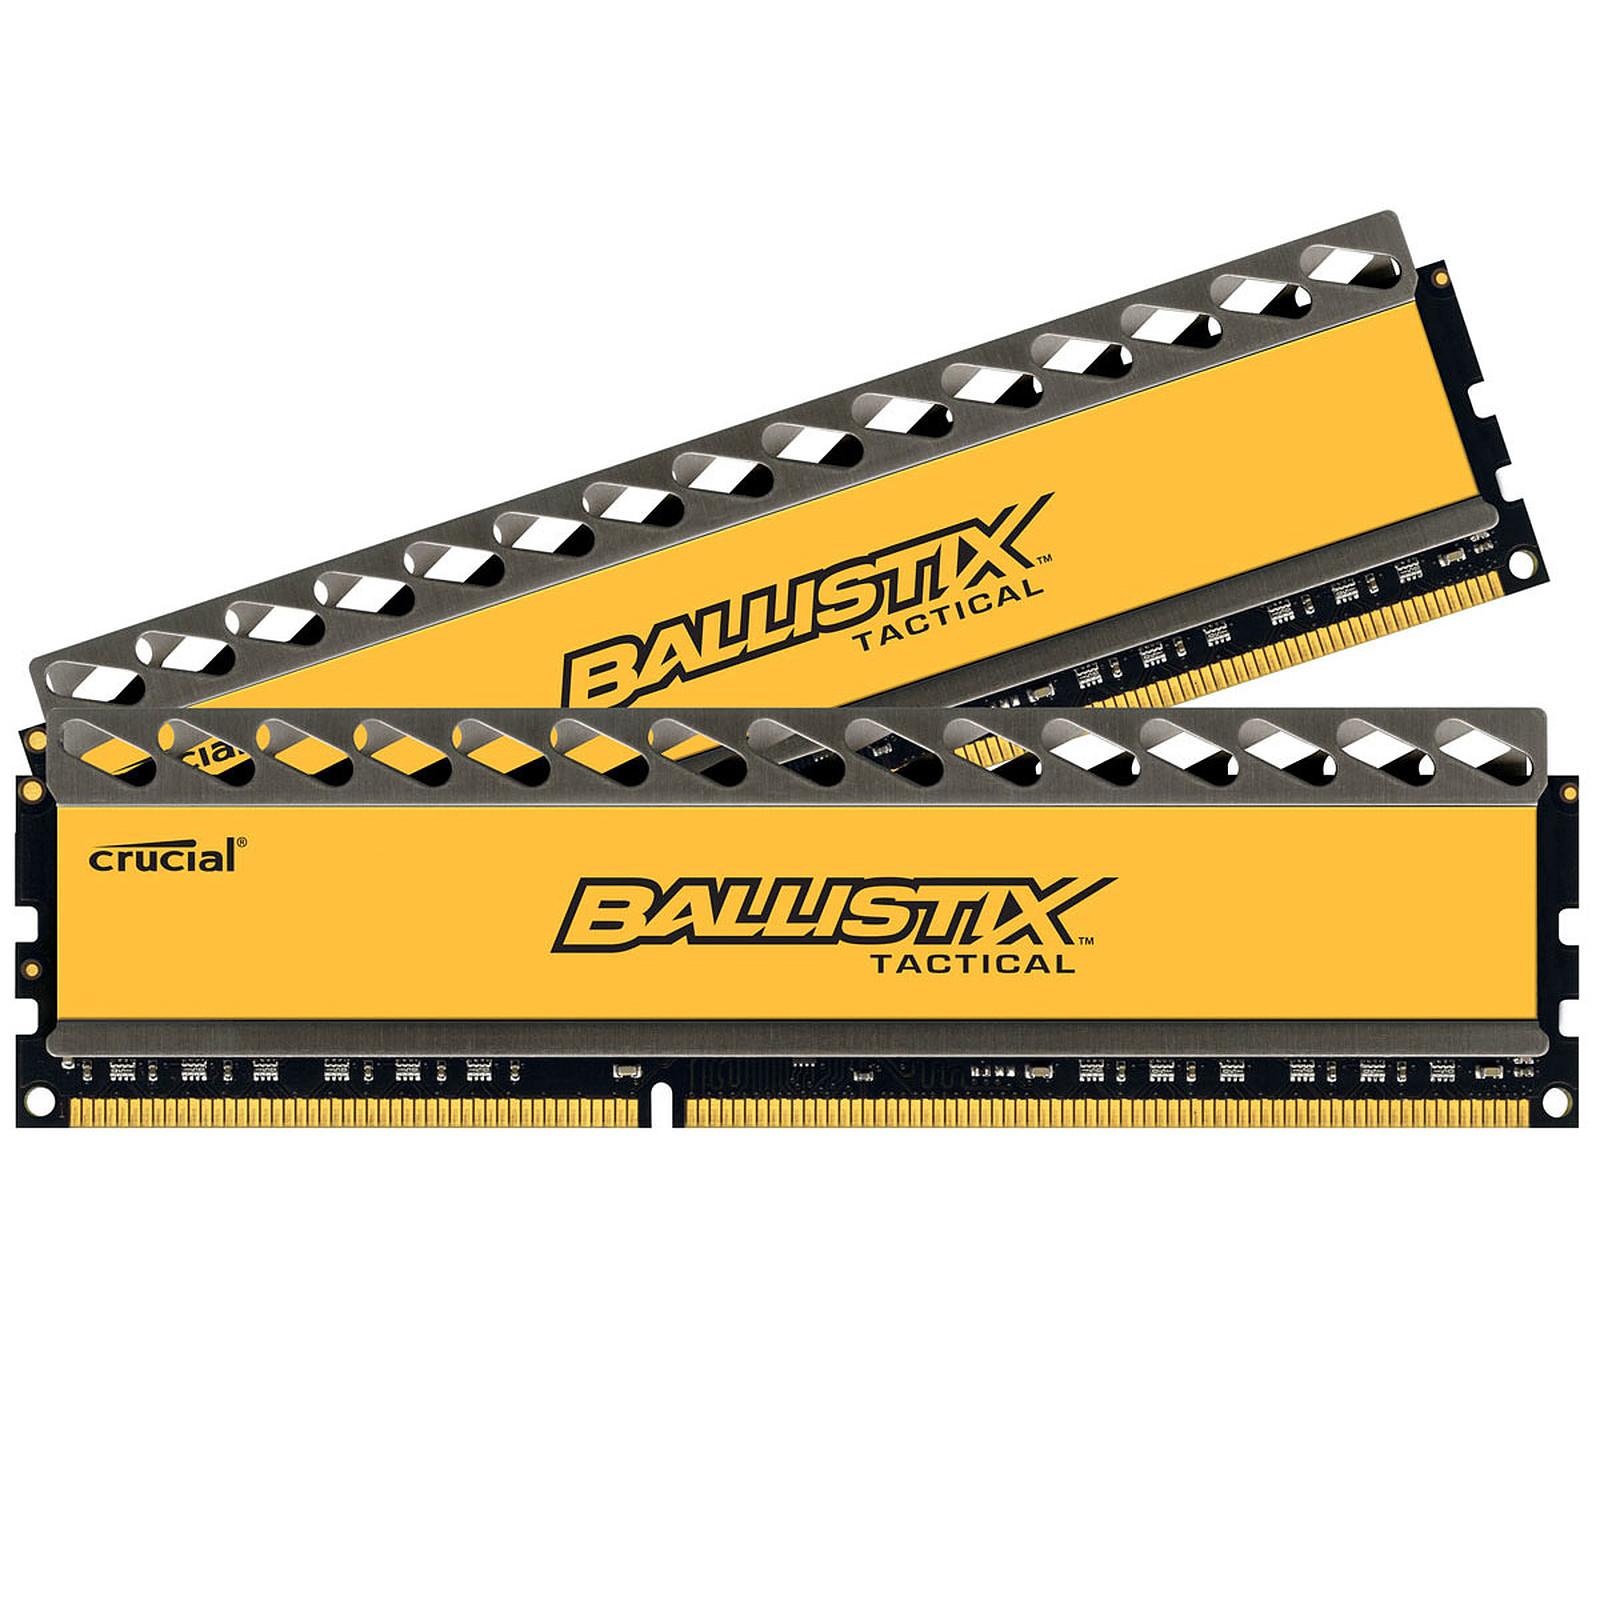 Ballistix Tactical 16 Go (2 x 8 Go) DDR3 1866 MHz CL9